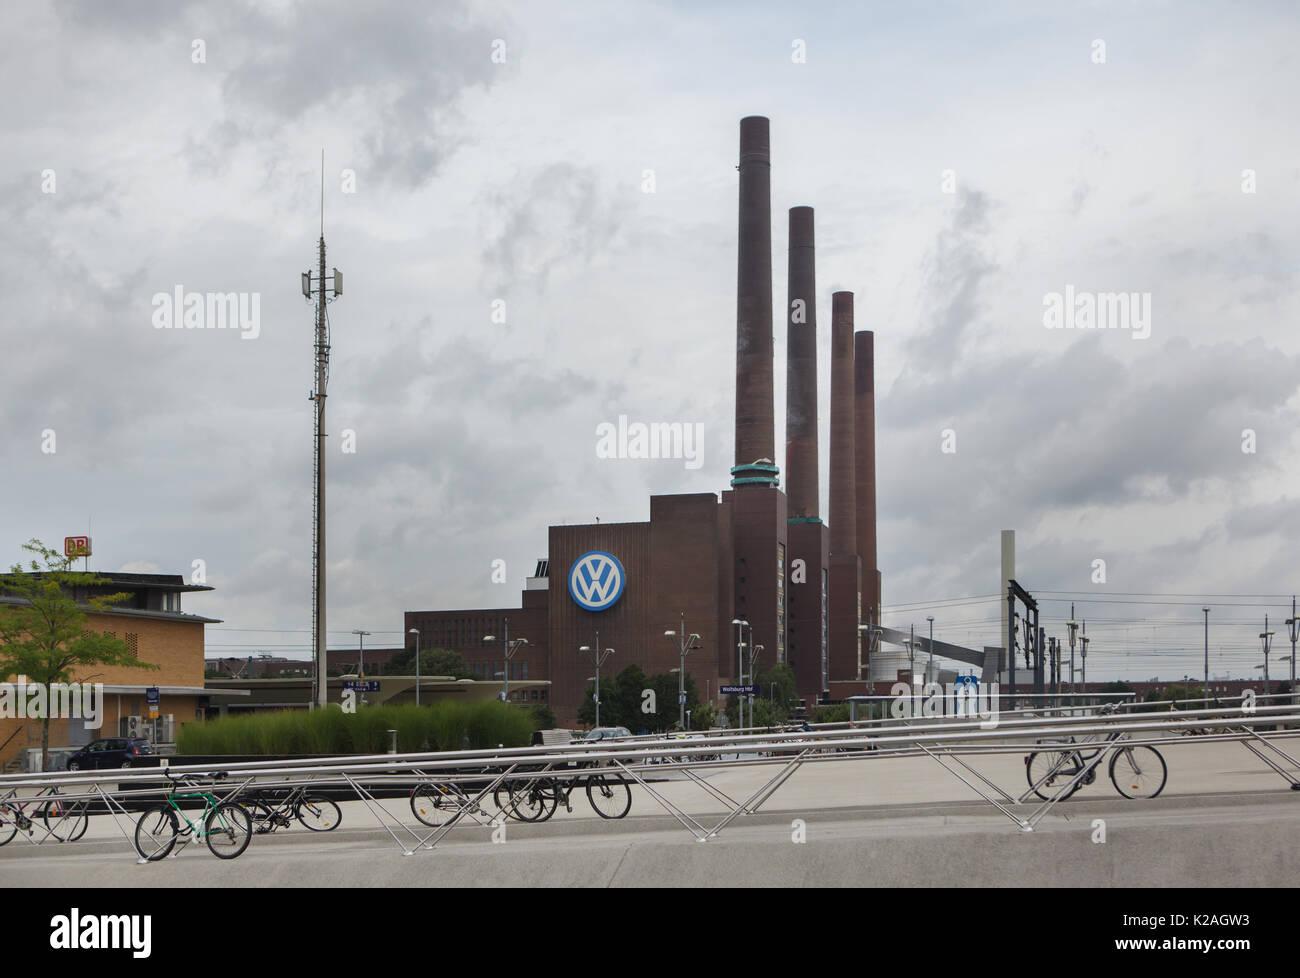 Cogeneration thermal power station Volkswagen Kraftwerk in Wolfsburg, Lower Saxony, Germany. Stock Photo